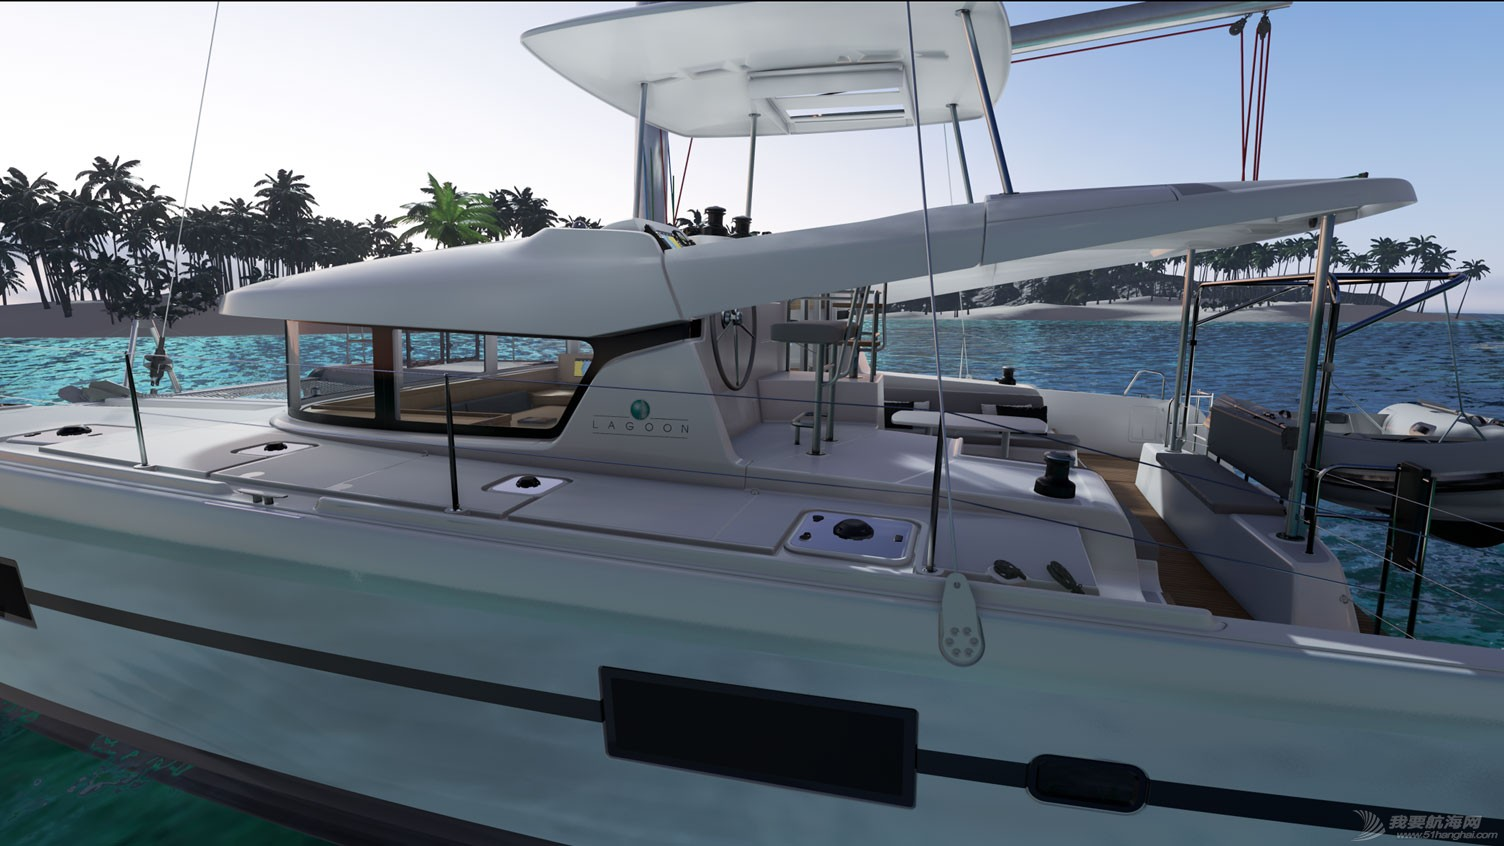 帆船 lagoon 42 蓝高42双体帆船 LAGOON 42双体帆船